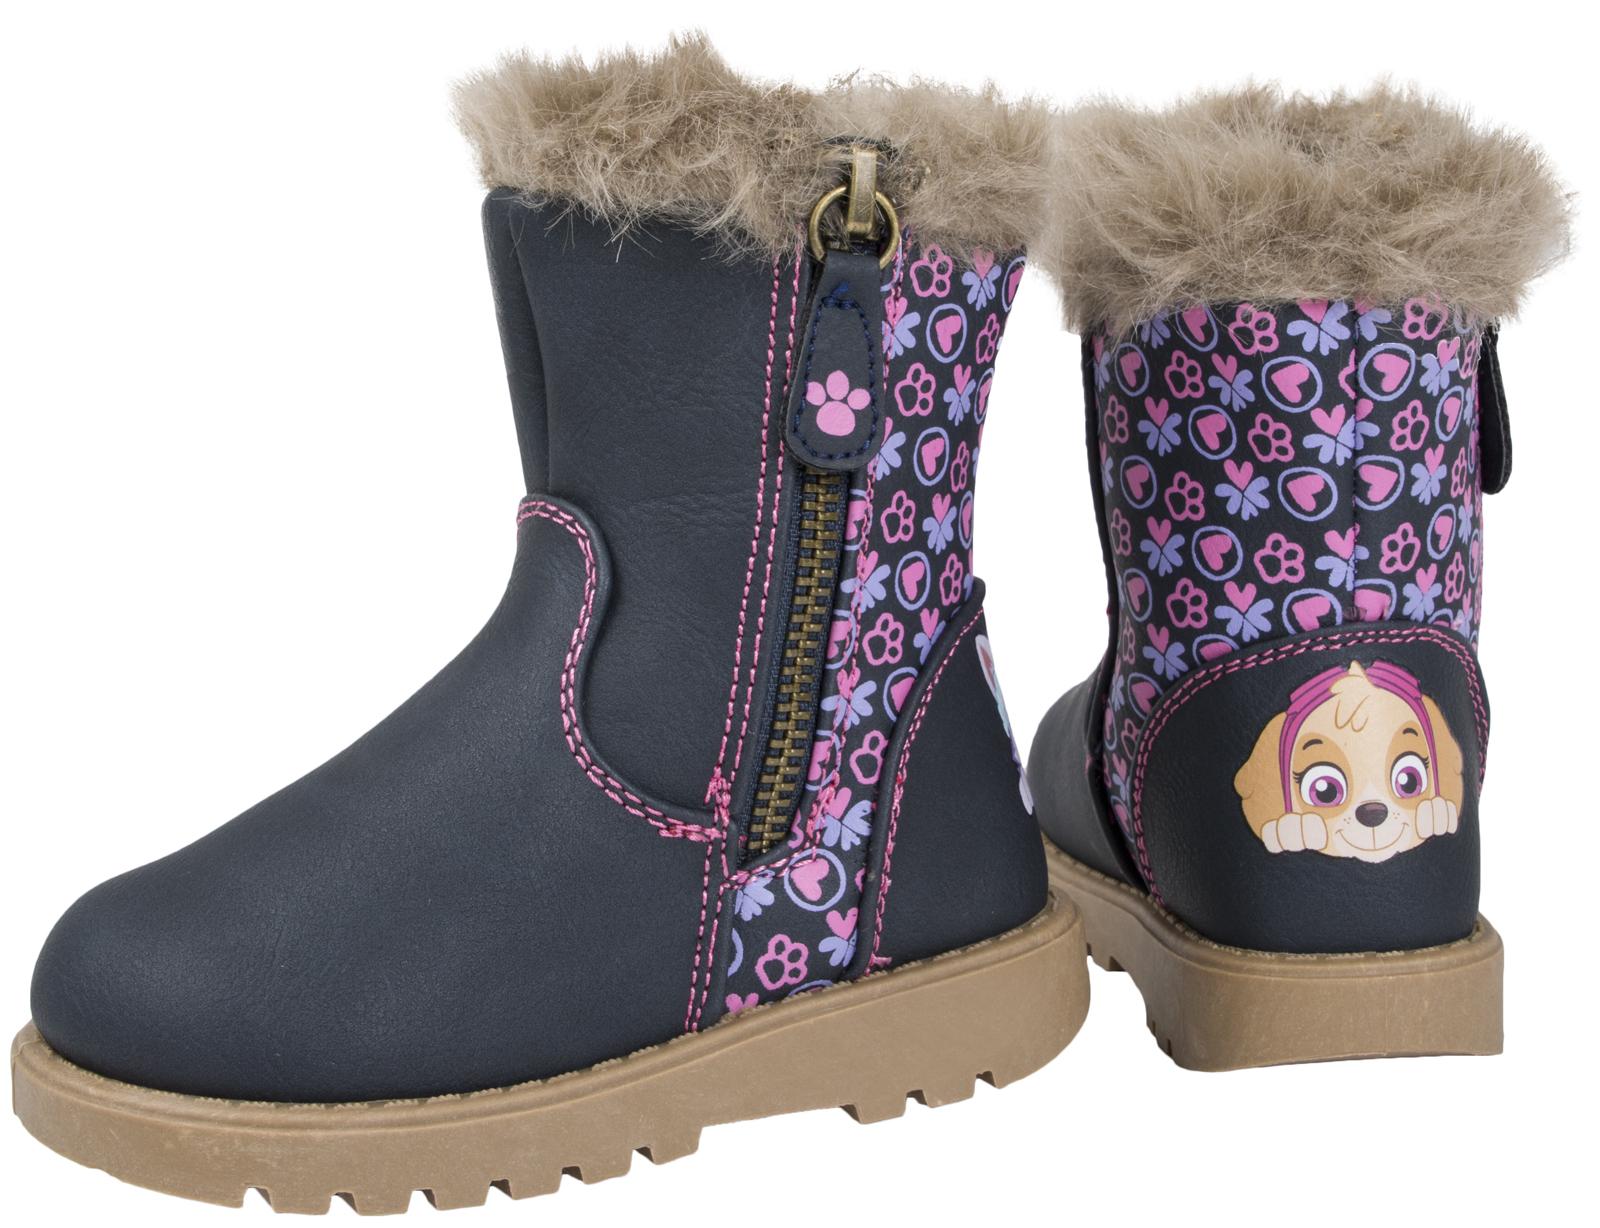 Girls Paw Patrol Boots Mid Calf Warm